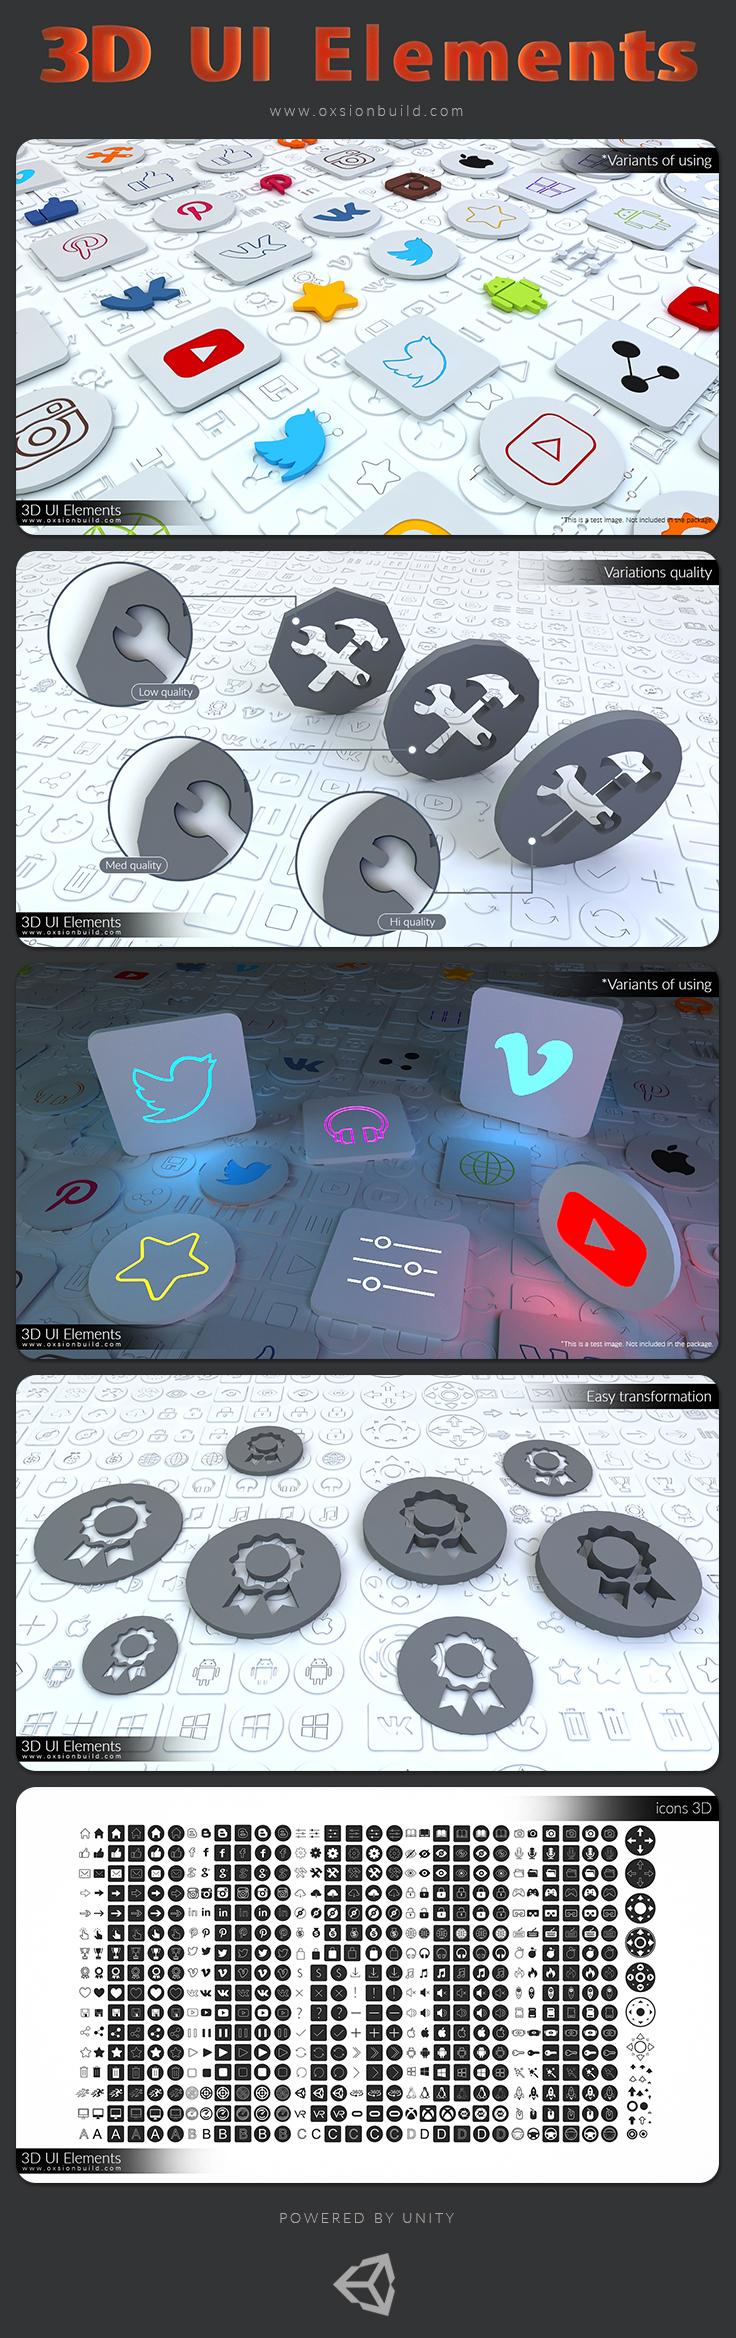 UI GUI user interface 3D alphabet number symbol icons